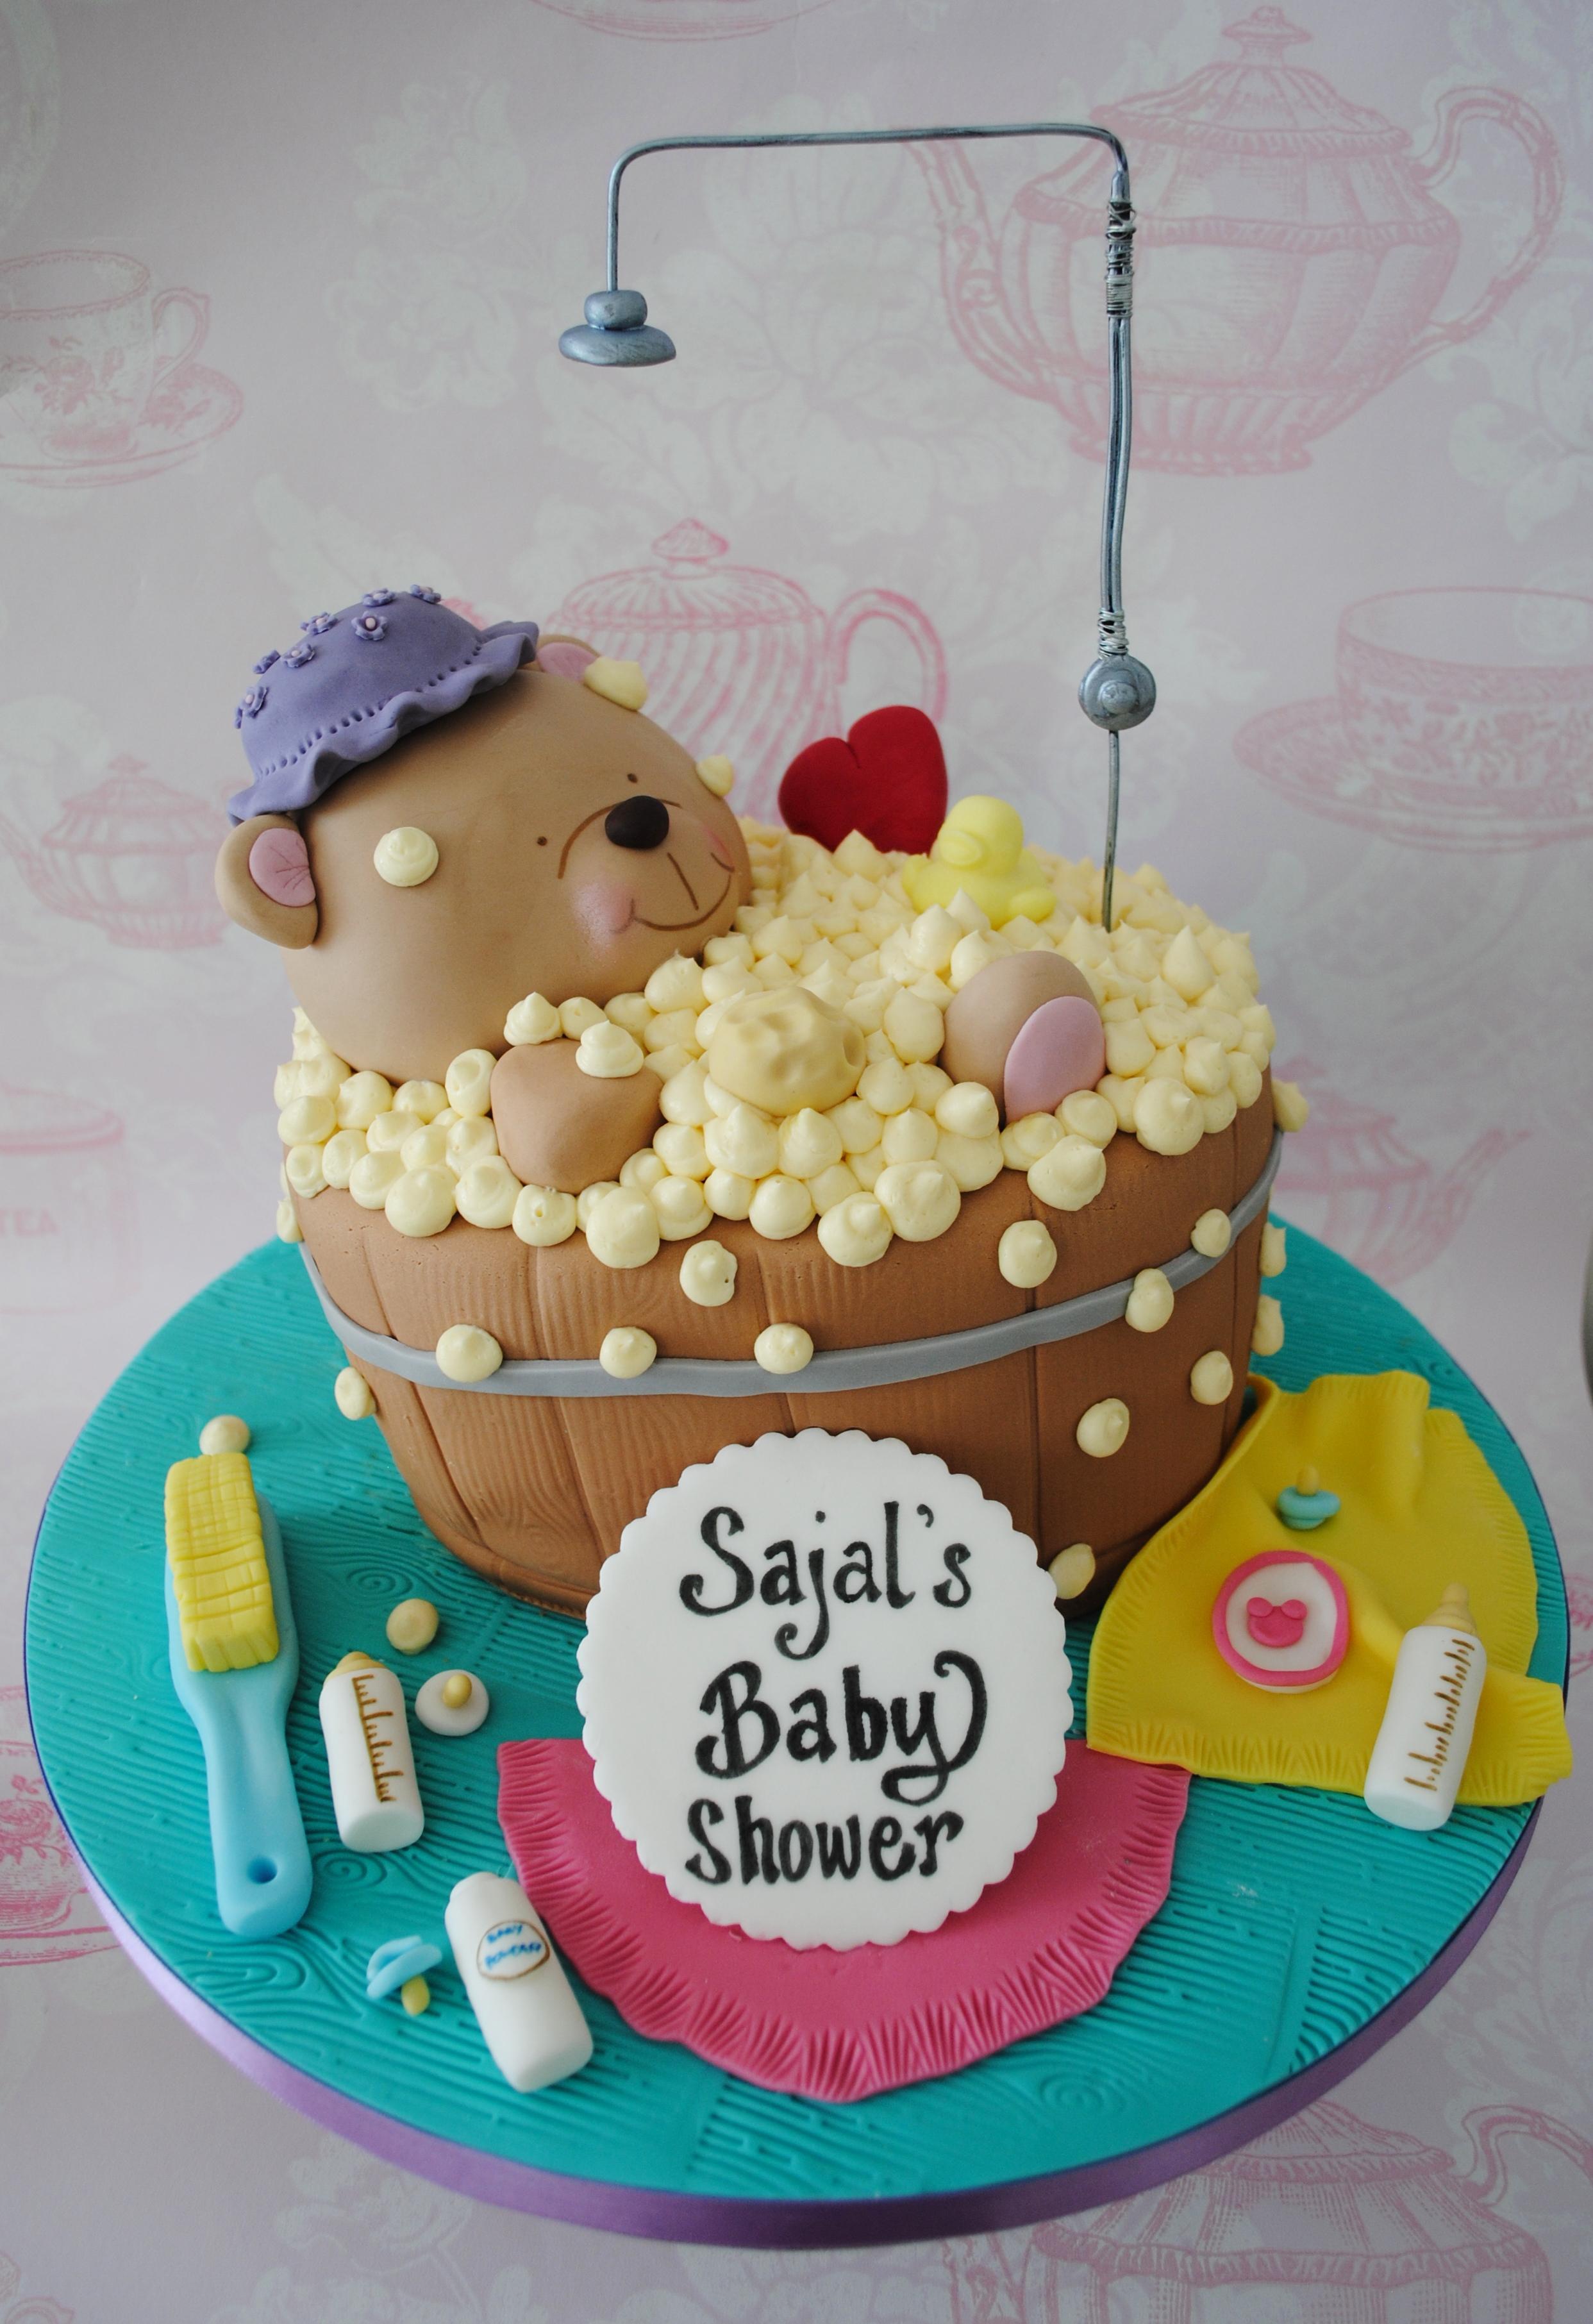 Forever friends bath baby shower cake